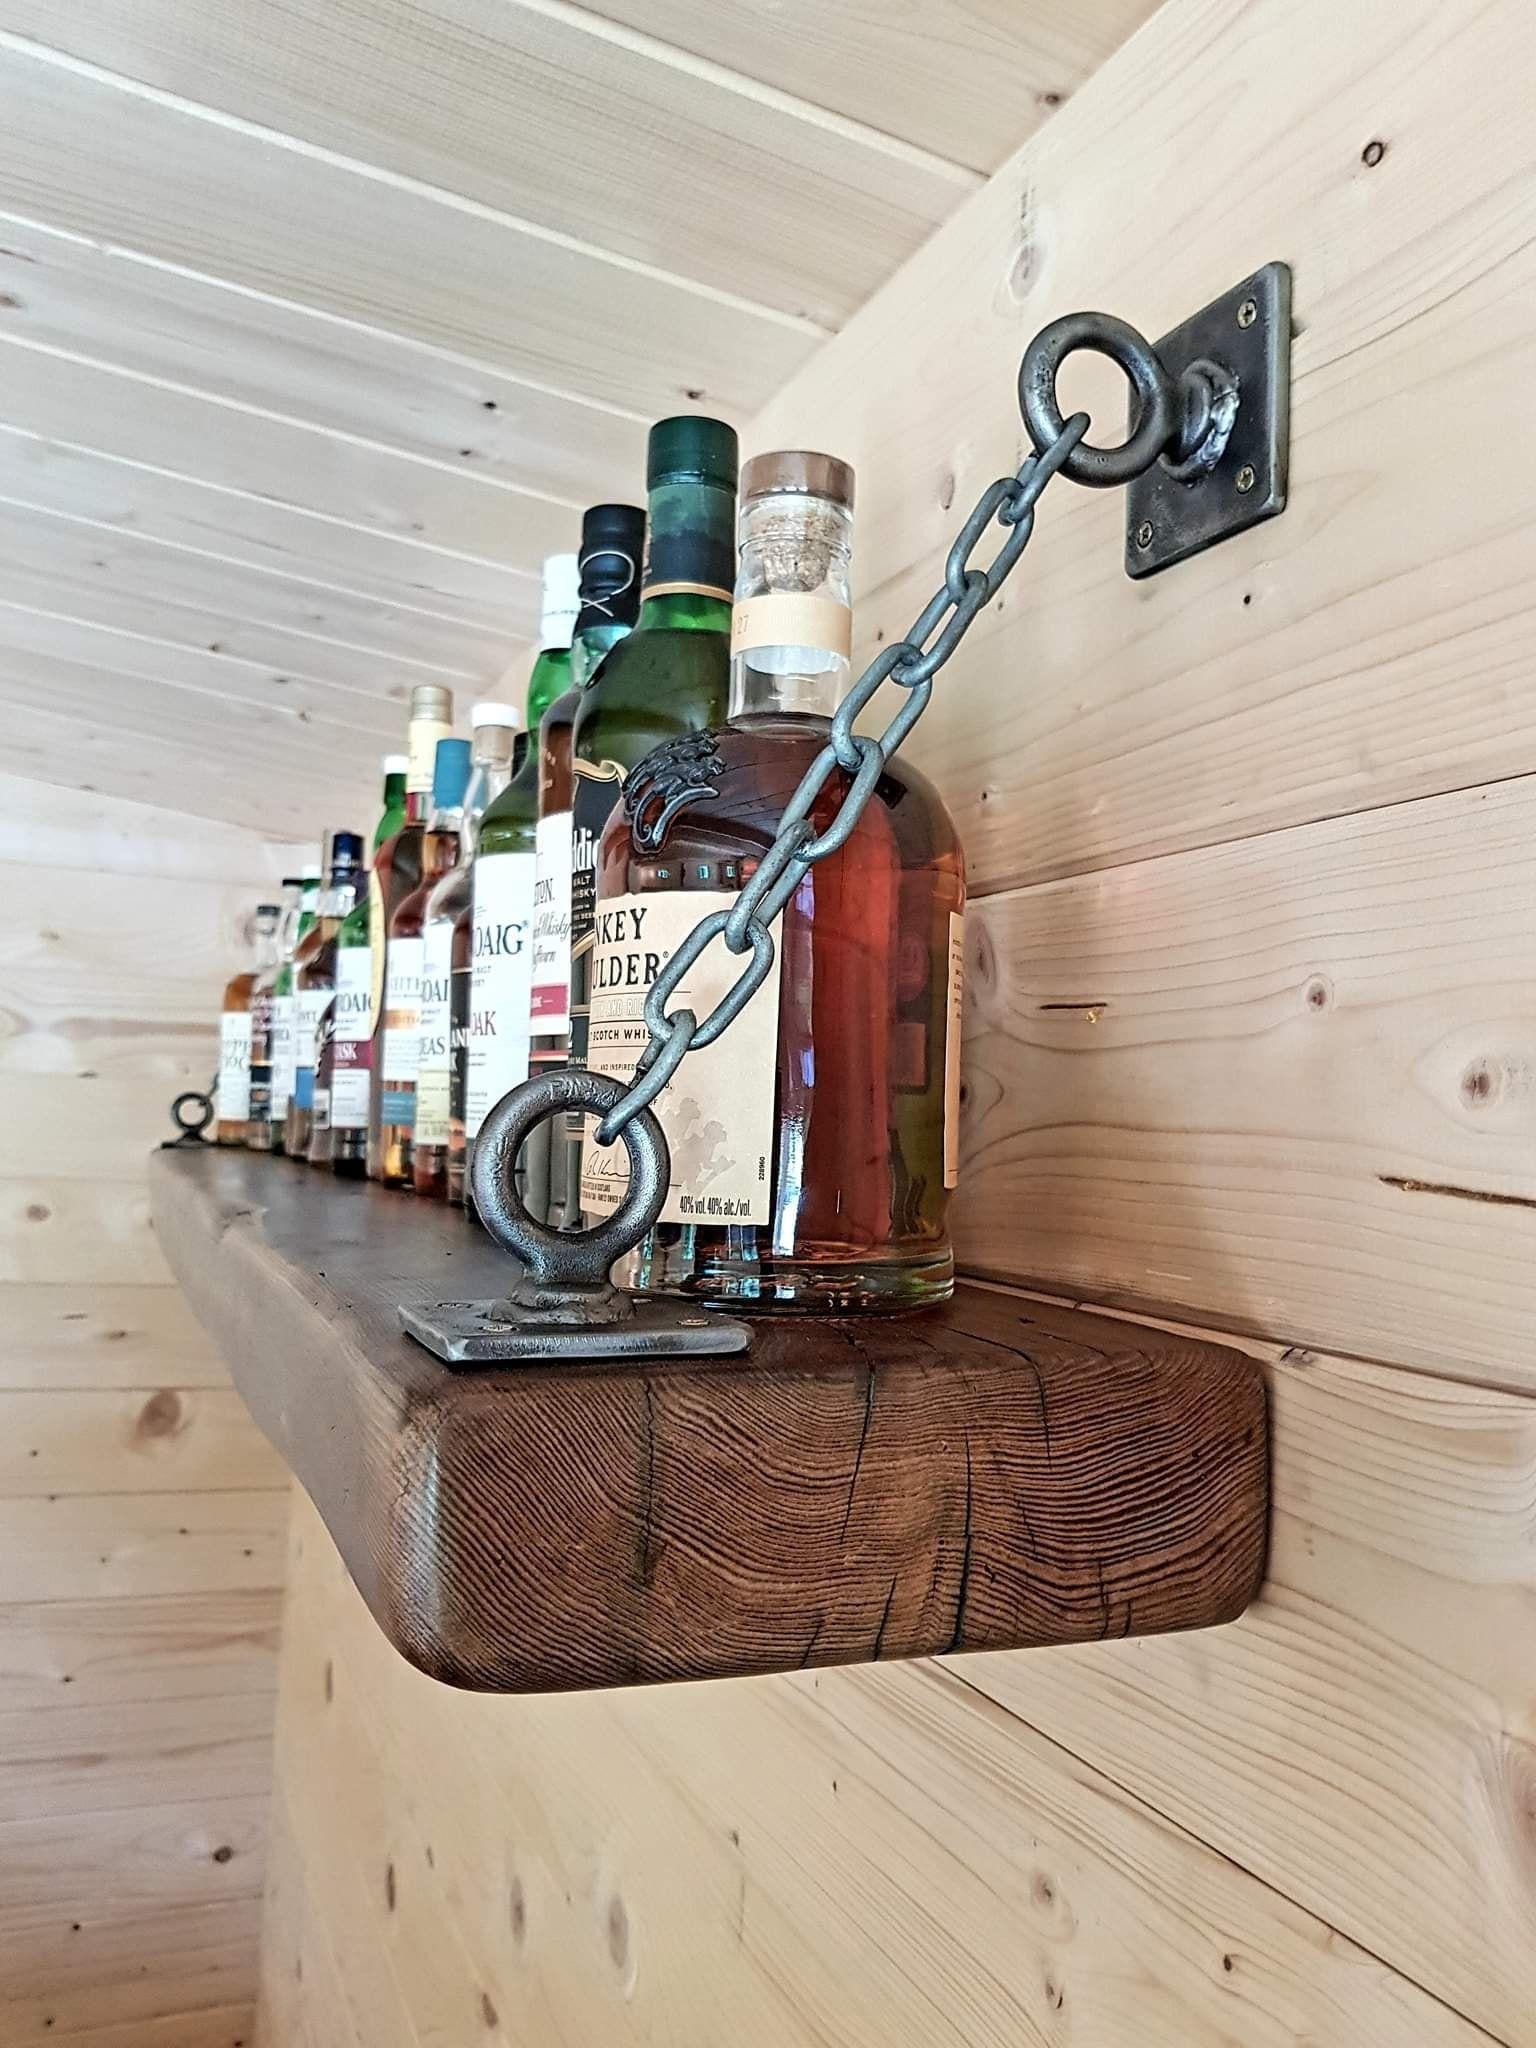 Solid English Oak Rustic Industrial Farmhouse Style Shelf With Metal Industrial Chains | Creative Fab Worx | Creative Fab Worx